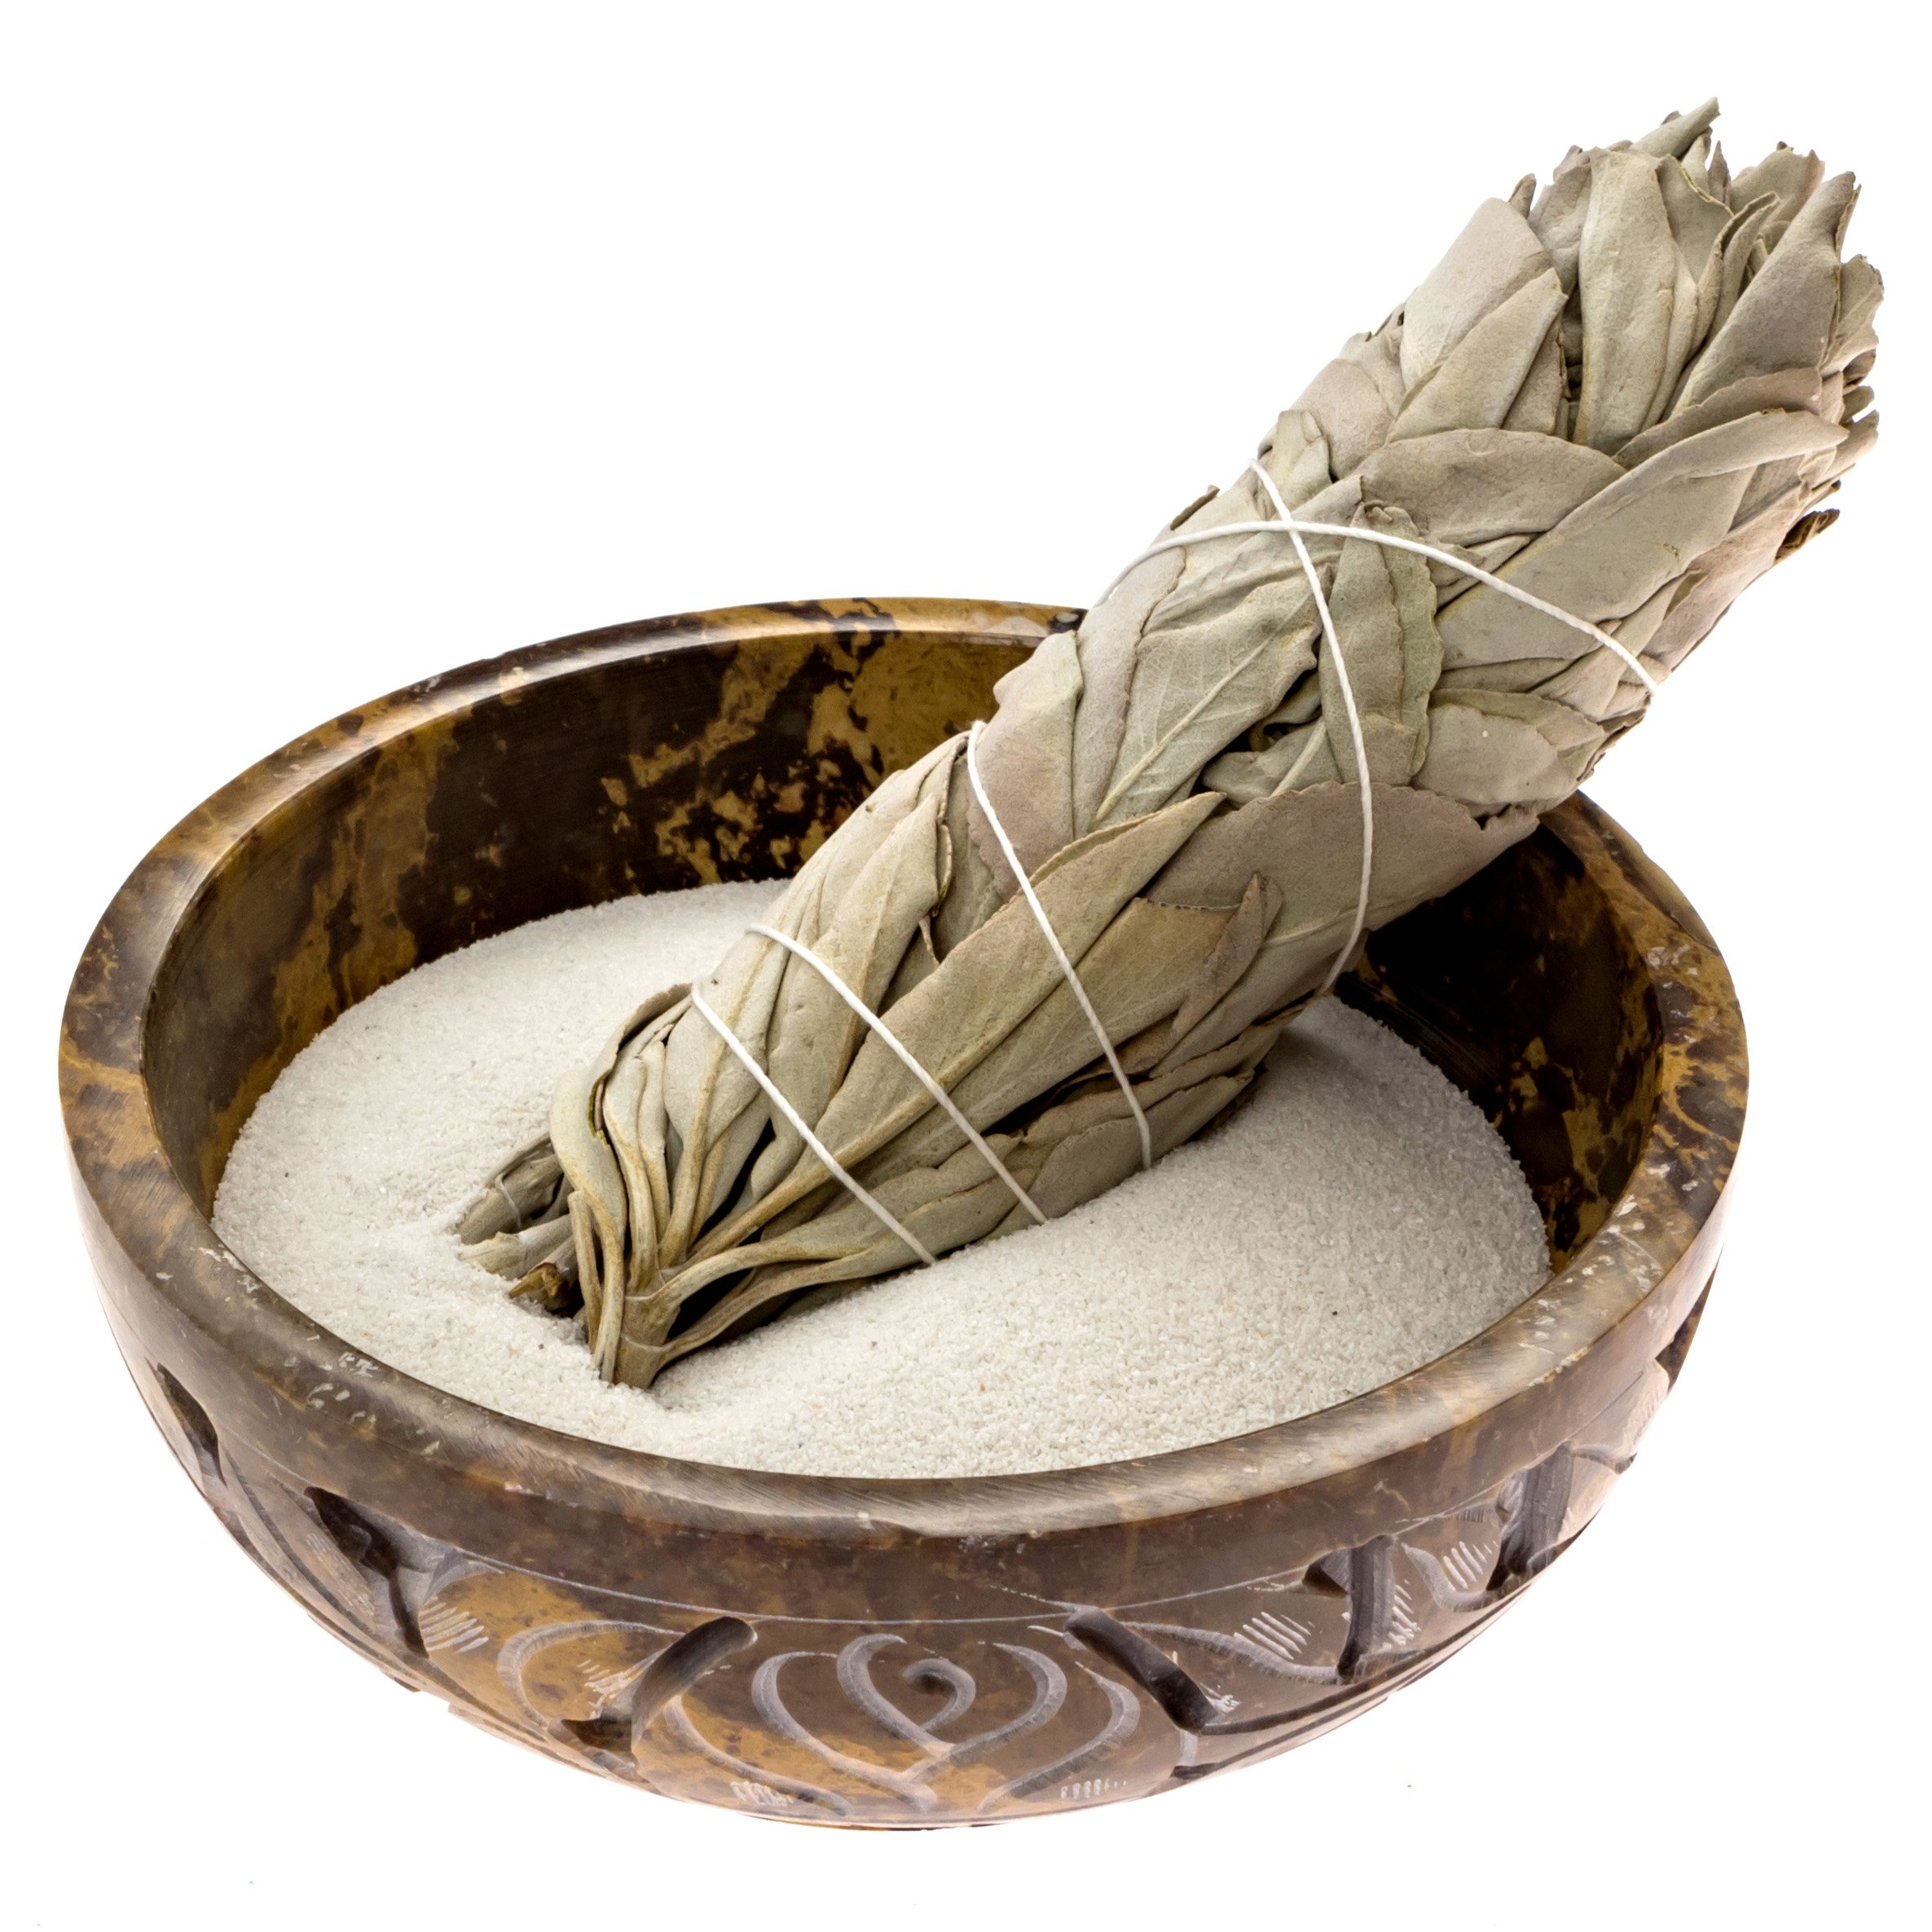 Alternative Imagination Soapstone Smudge Bowl Kit with 1 California White Sage Smudge Stick, 2 Palo Santo Smudge Sticks, and 1/2 lb of White Sand (Deluxe) by Alternative Imagination (Image #5)